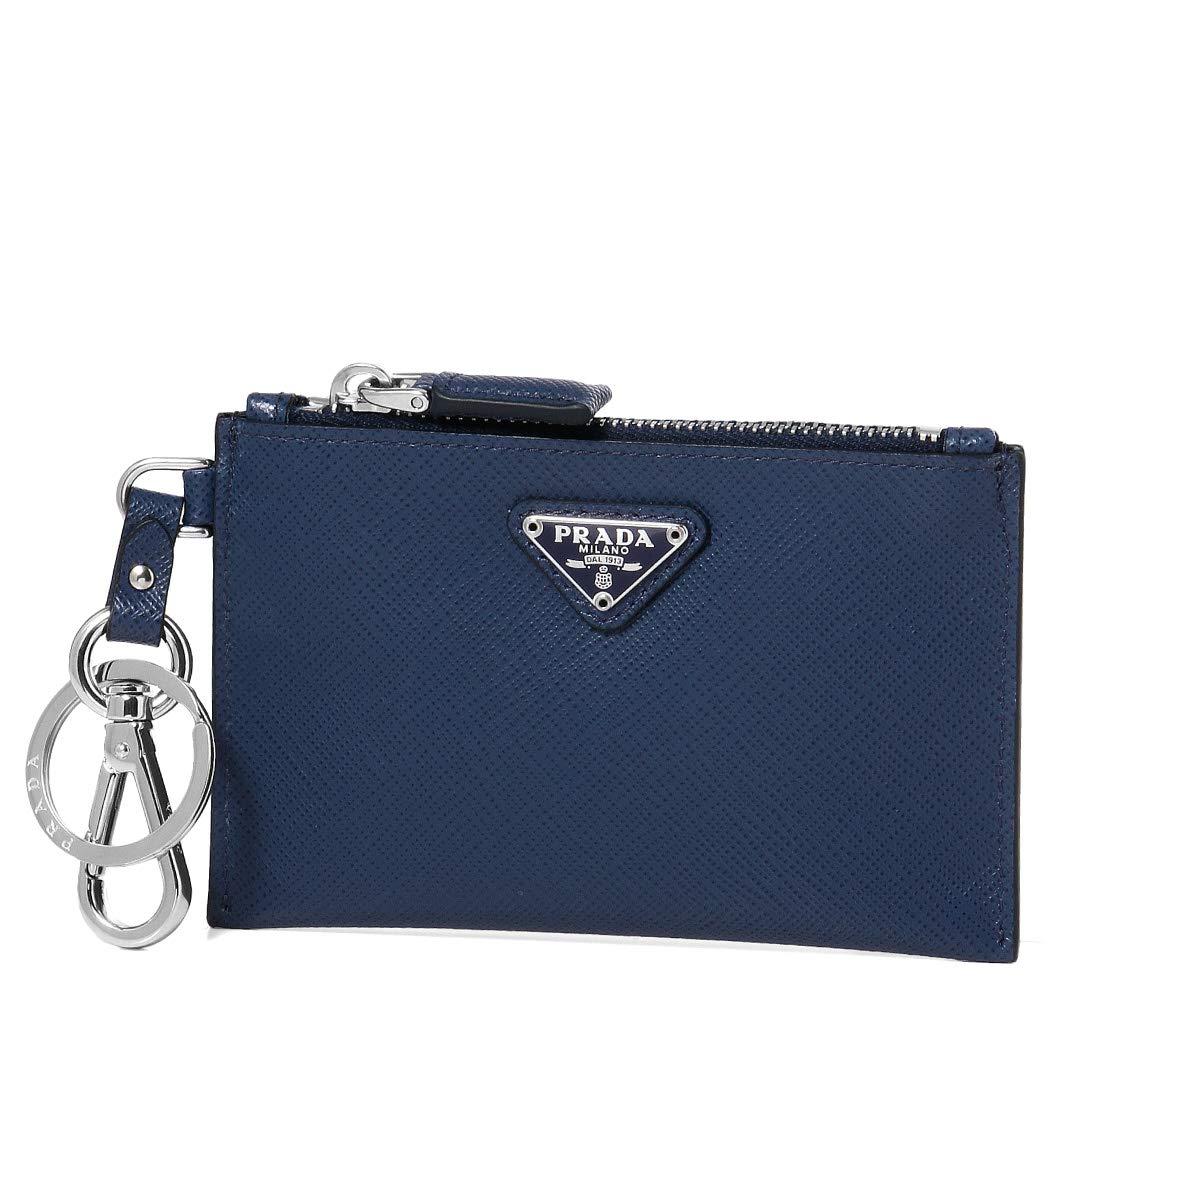 VigourTrader Women Crossbody Clutch Handbag Envelope Bag Fashion Shoulder Bag